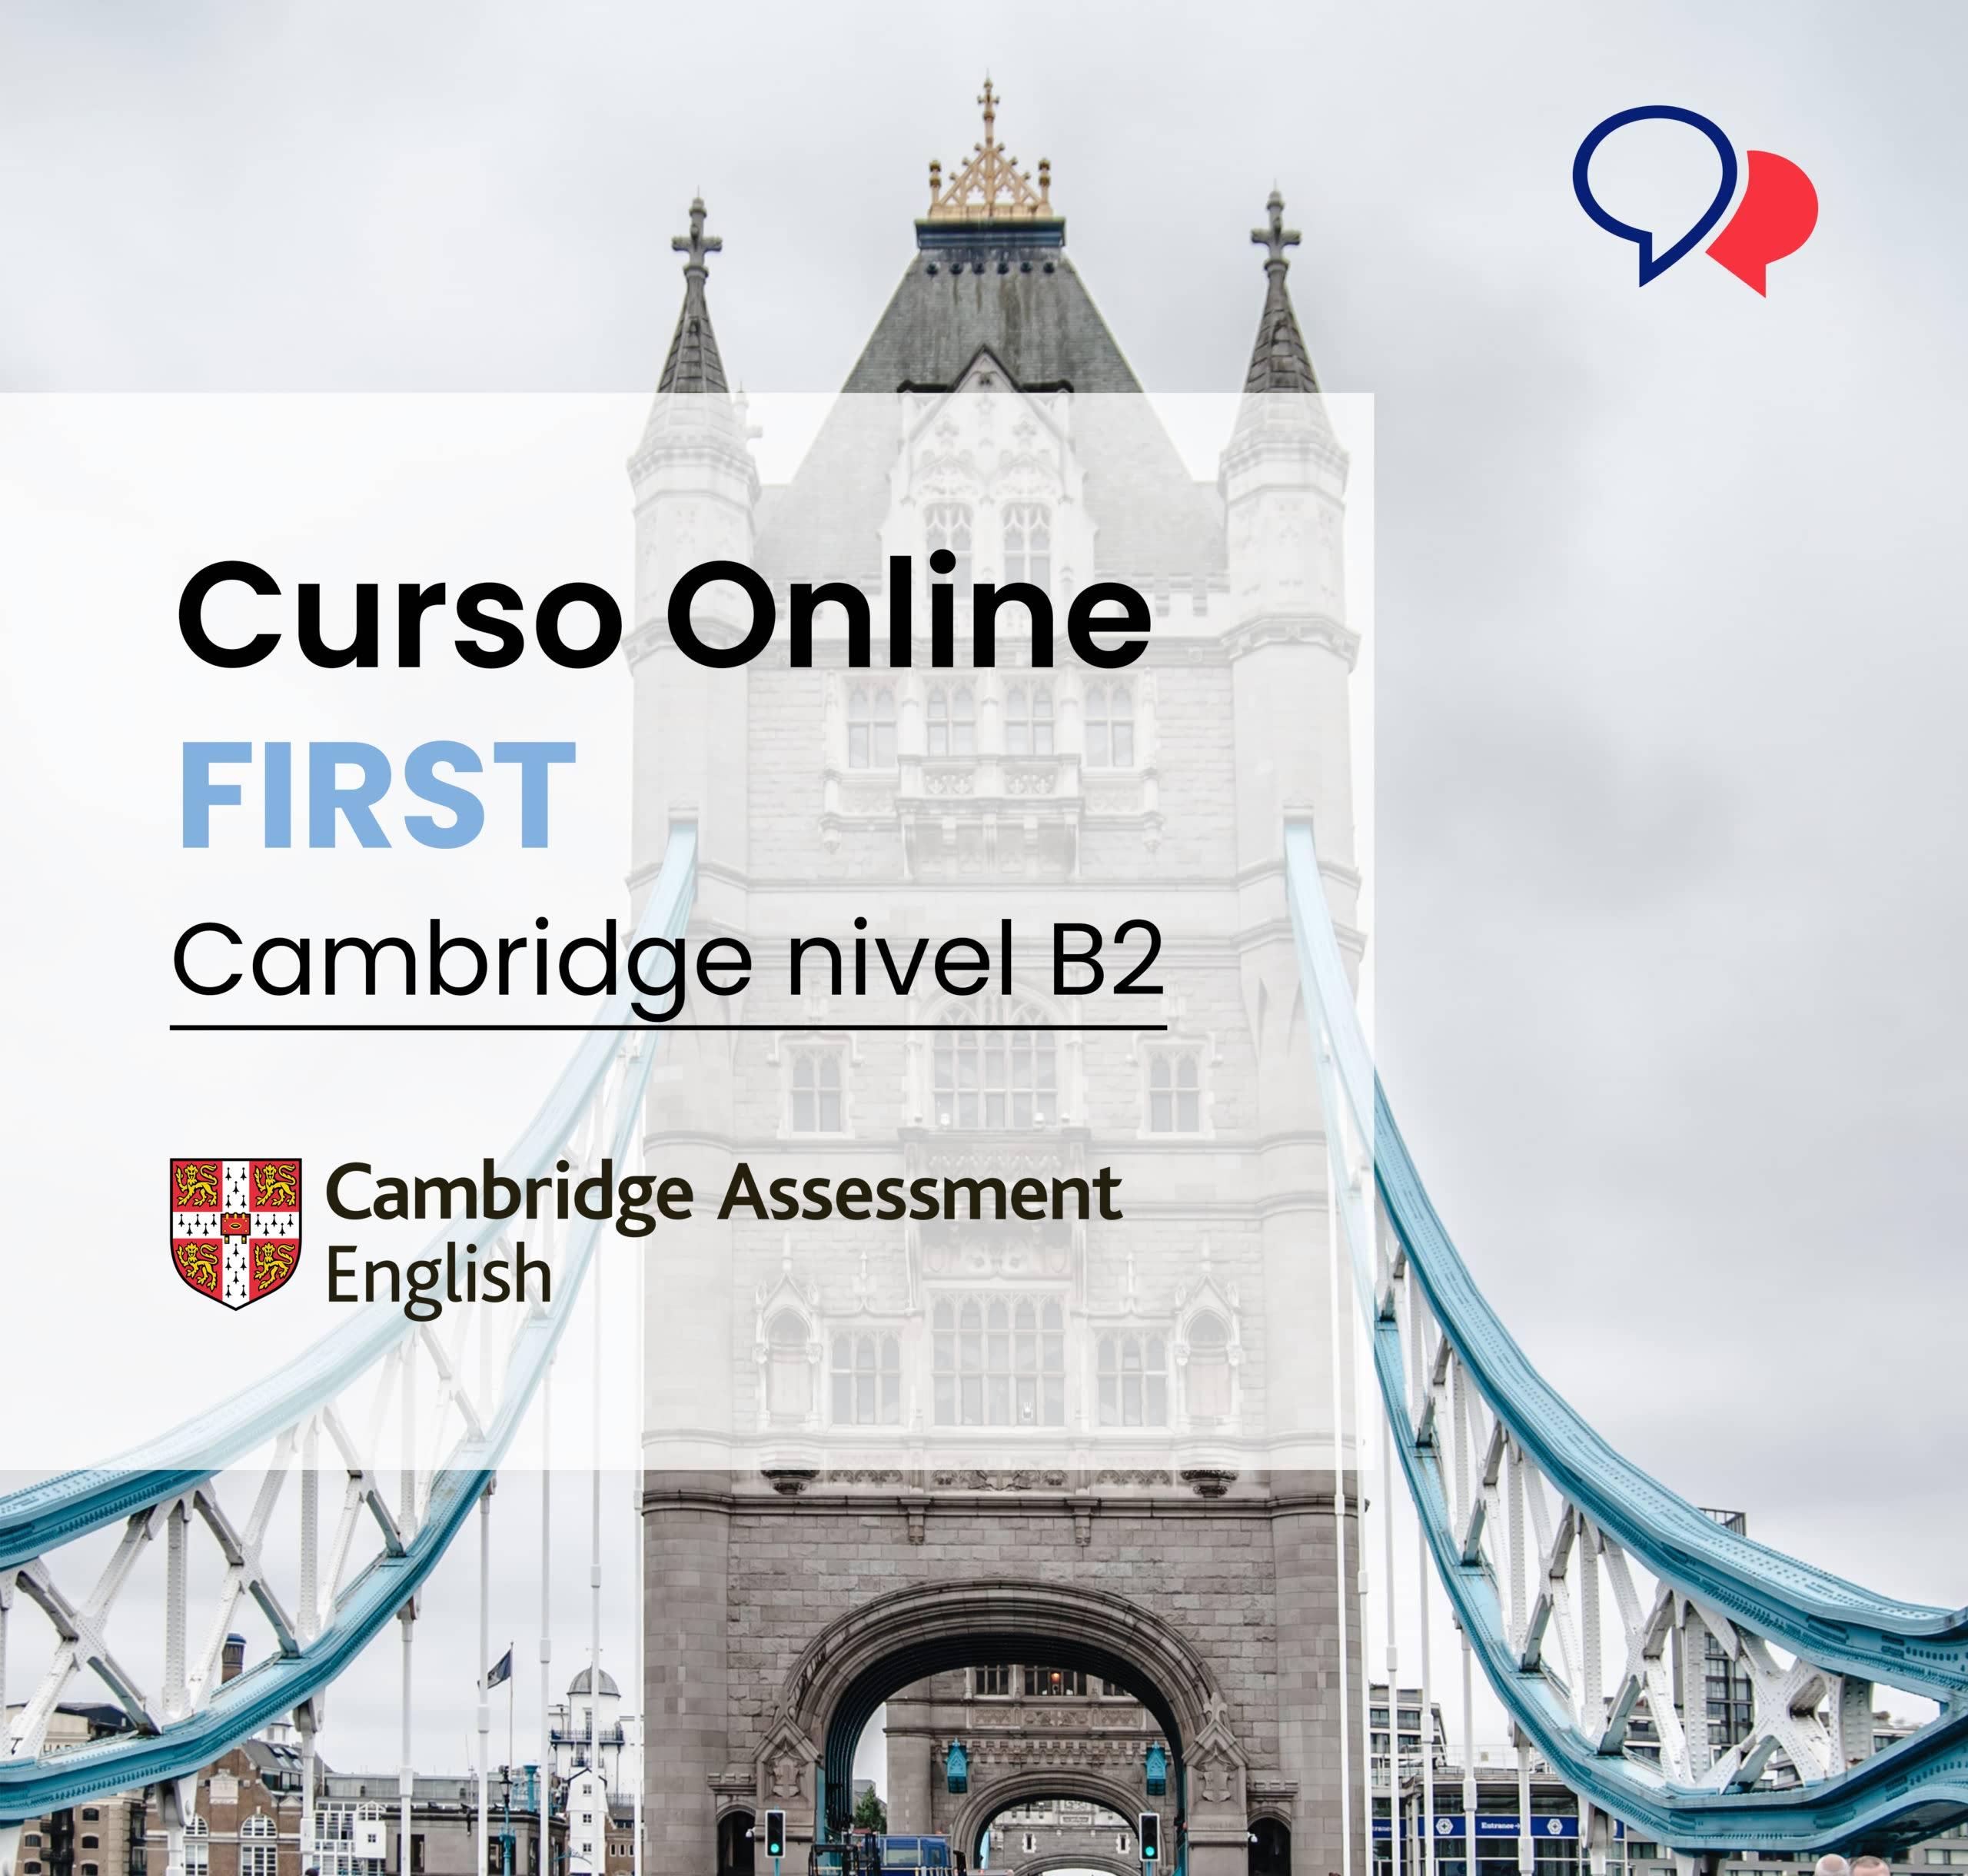 curso online first